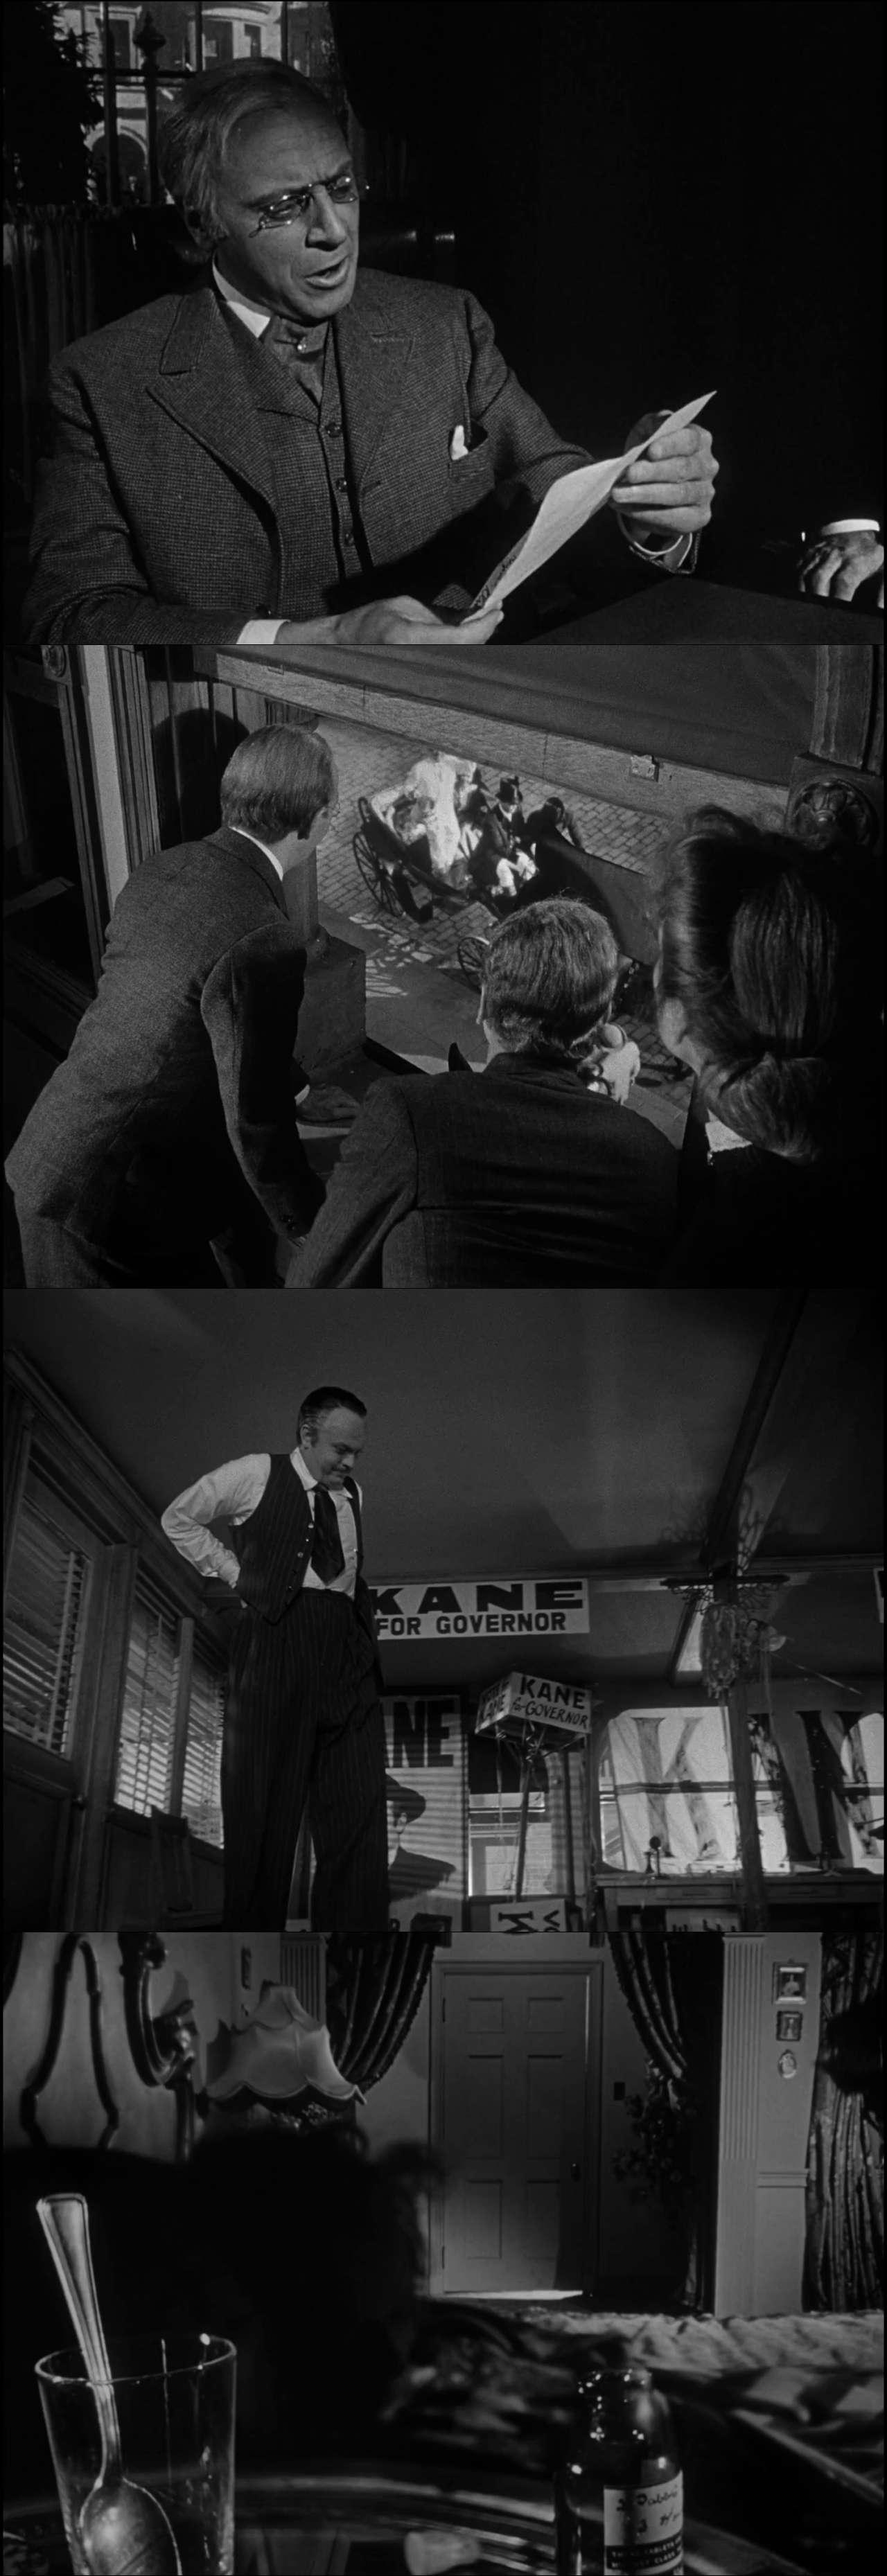 Yurttaş Kane - Citizen Kane (1941) türkçe dublaj full film indir